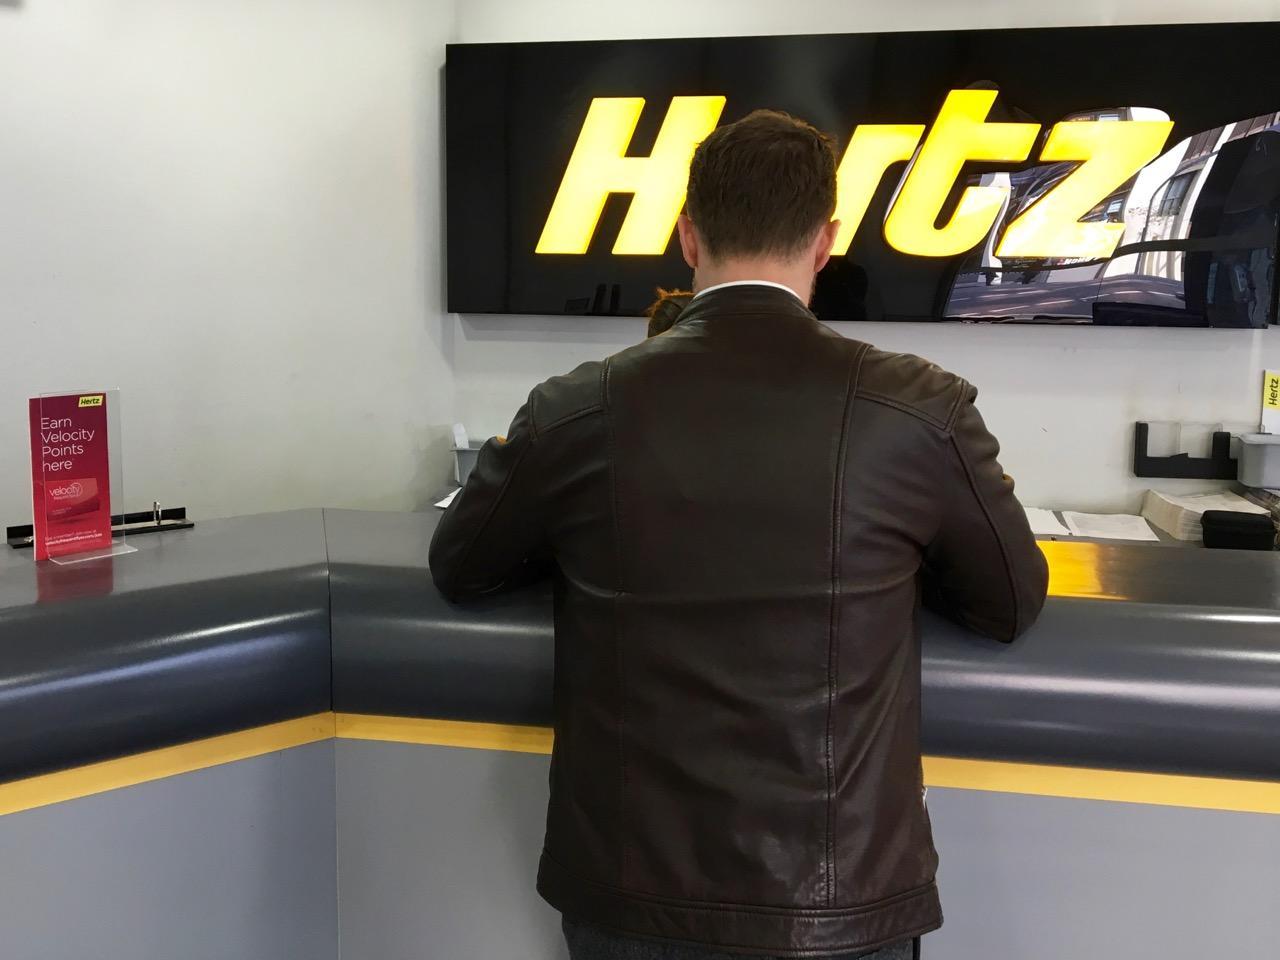 Hertz Qantas Business